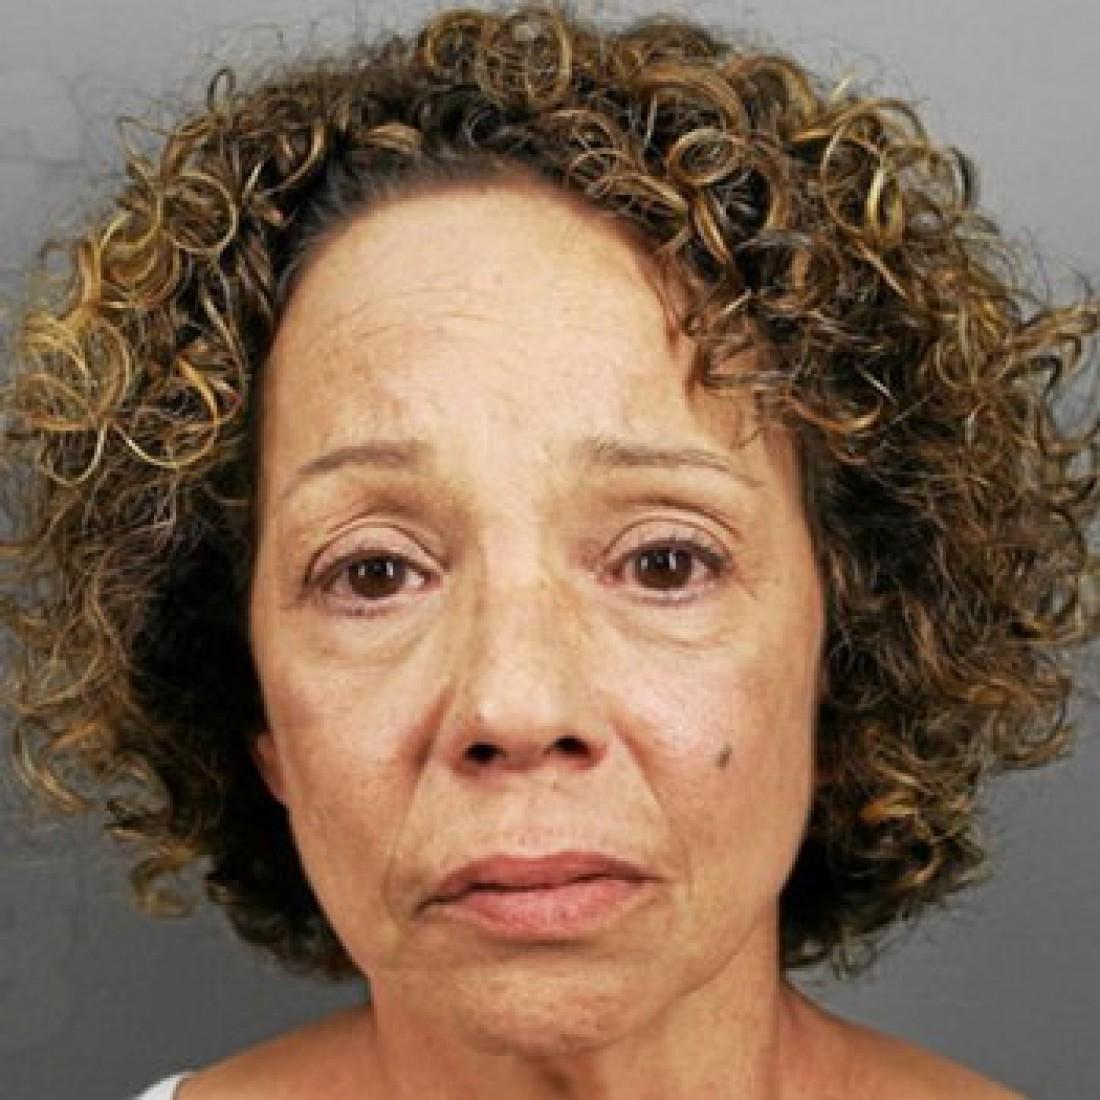 Сестра Мэрайи Кэри арестована запроституцию